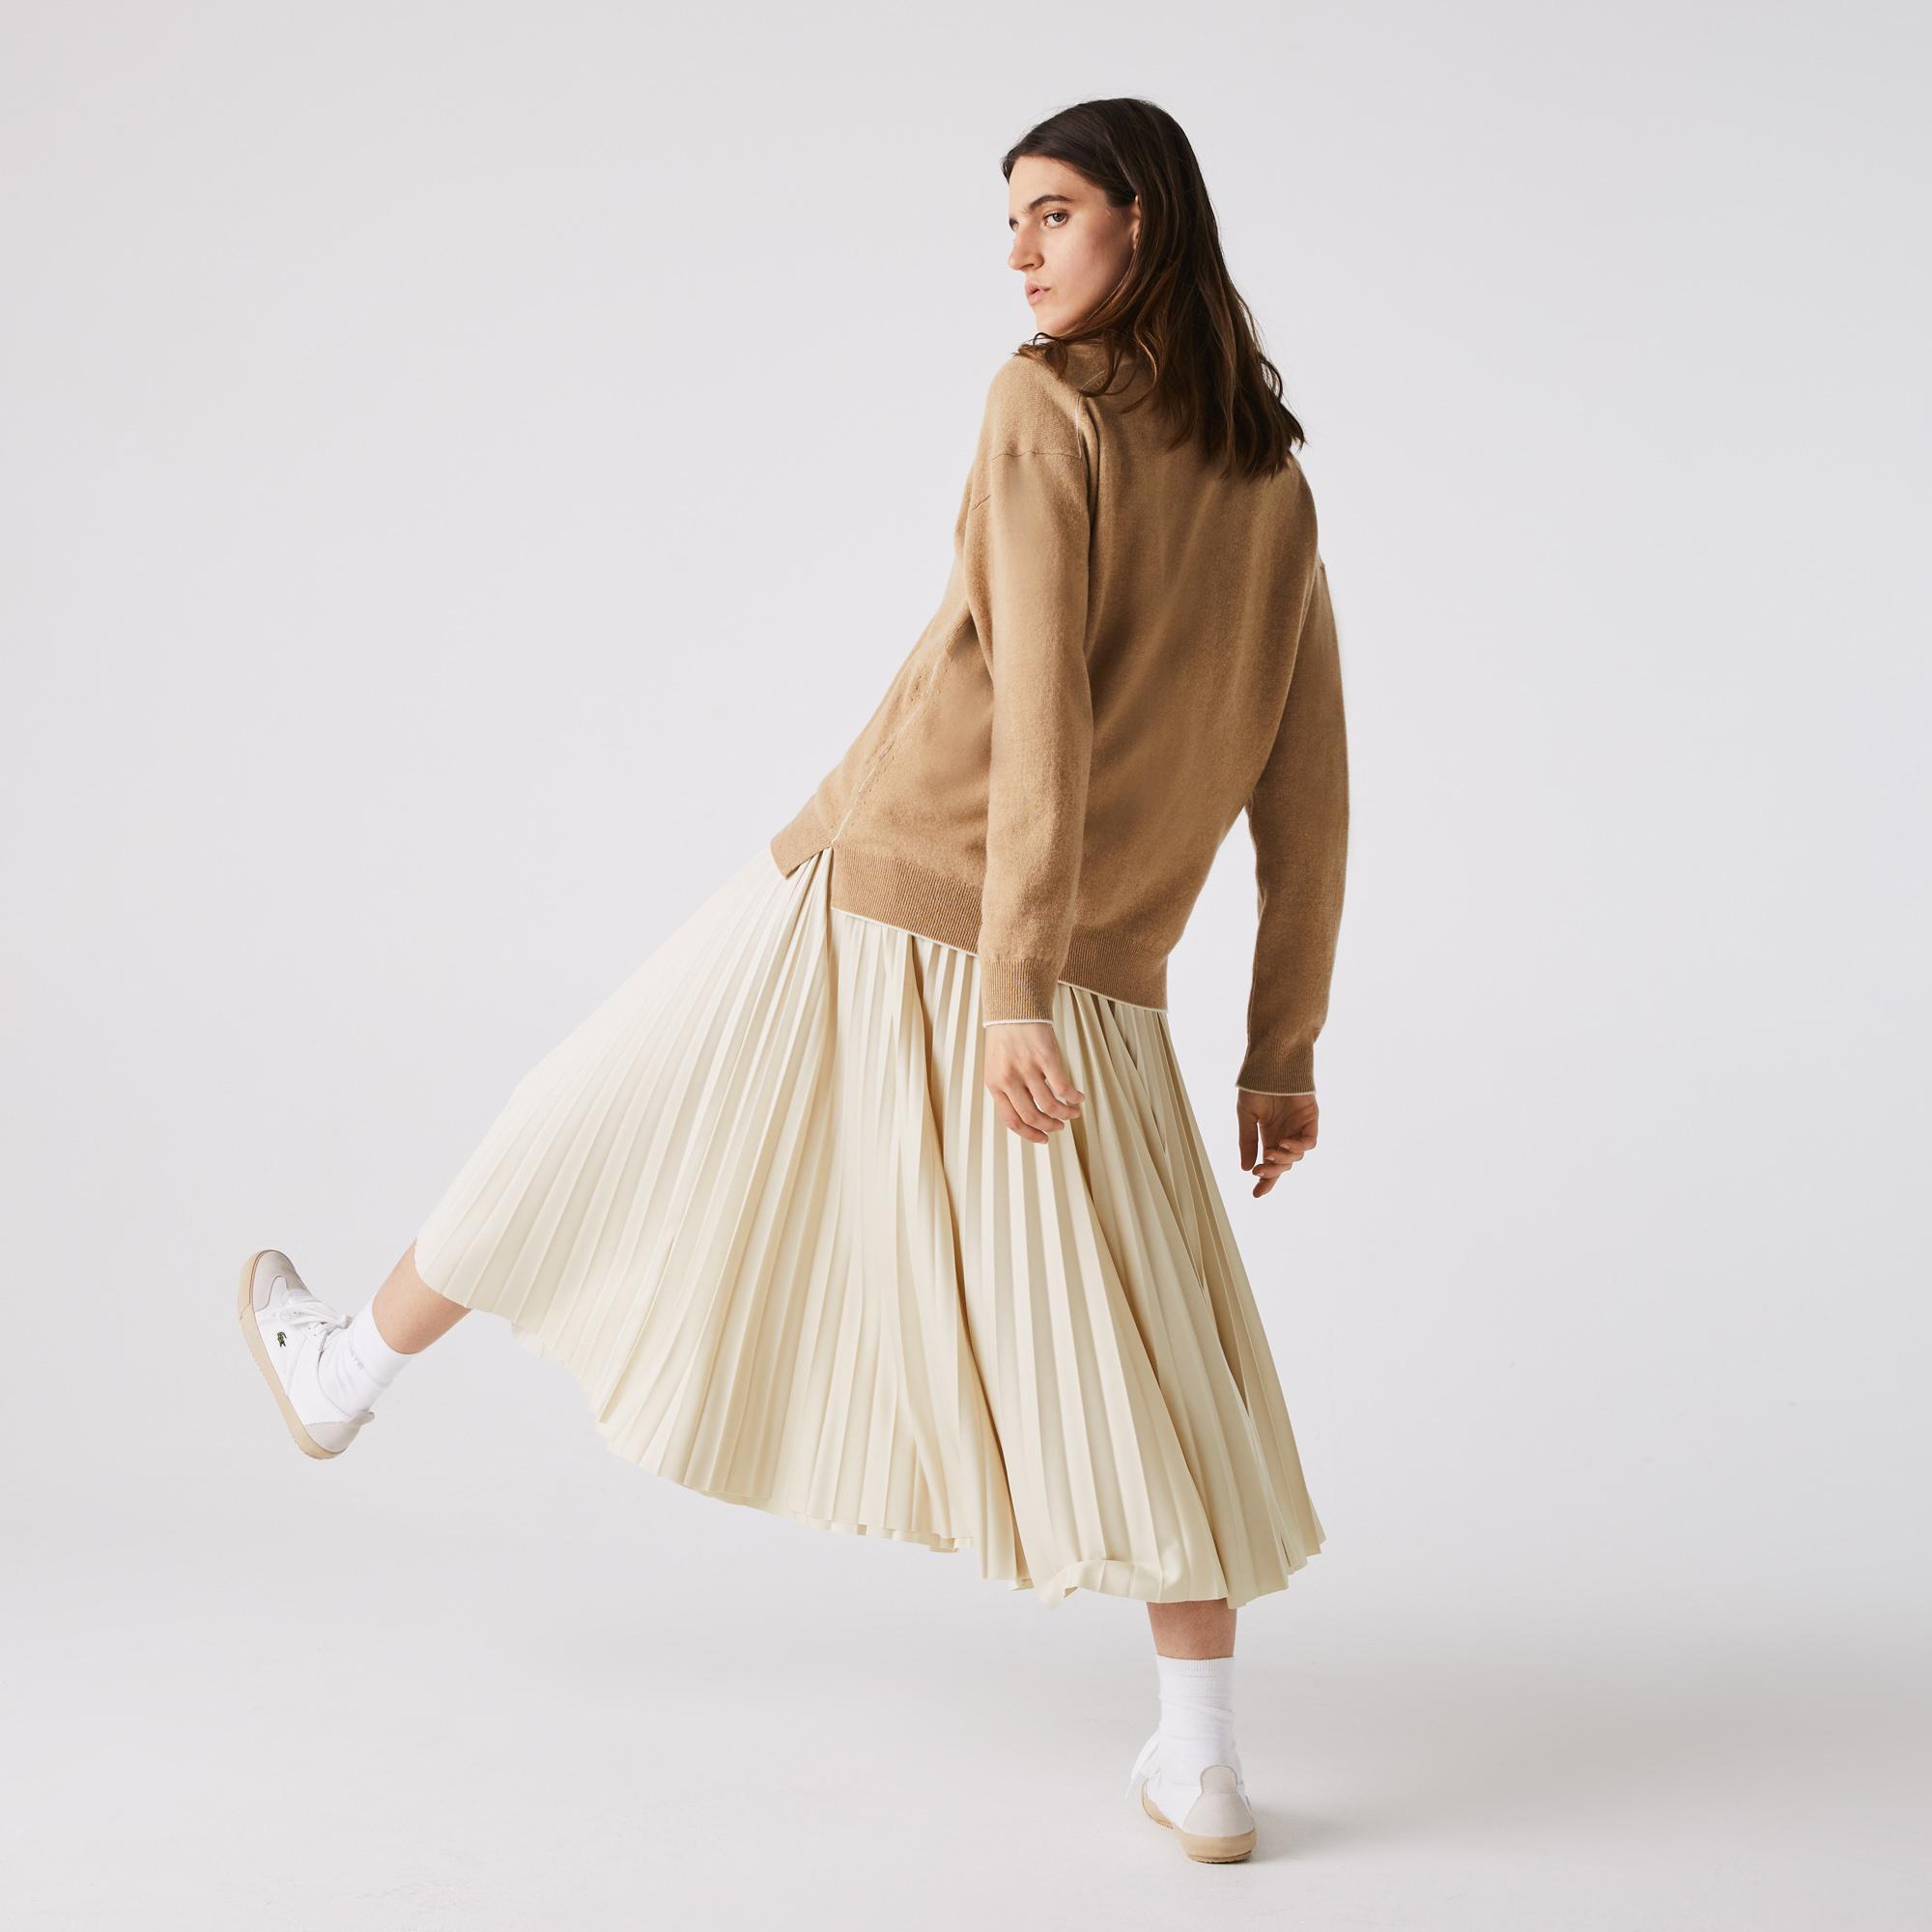 Lacoste Women's Branded Elasticised Pleated Skirt